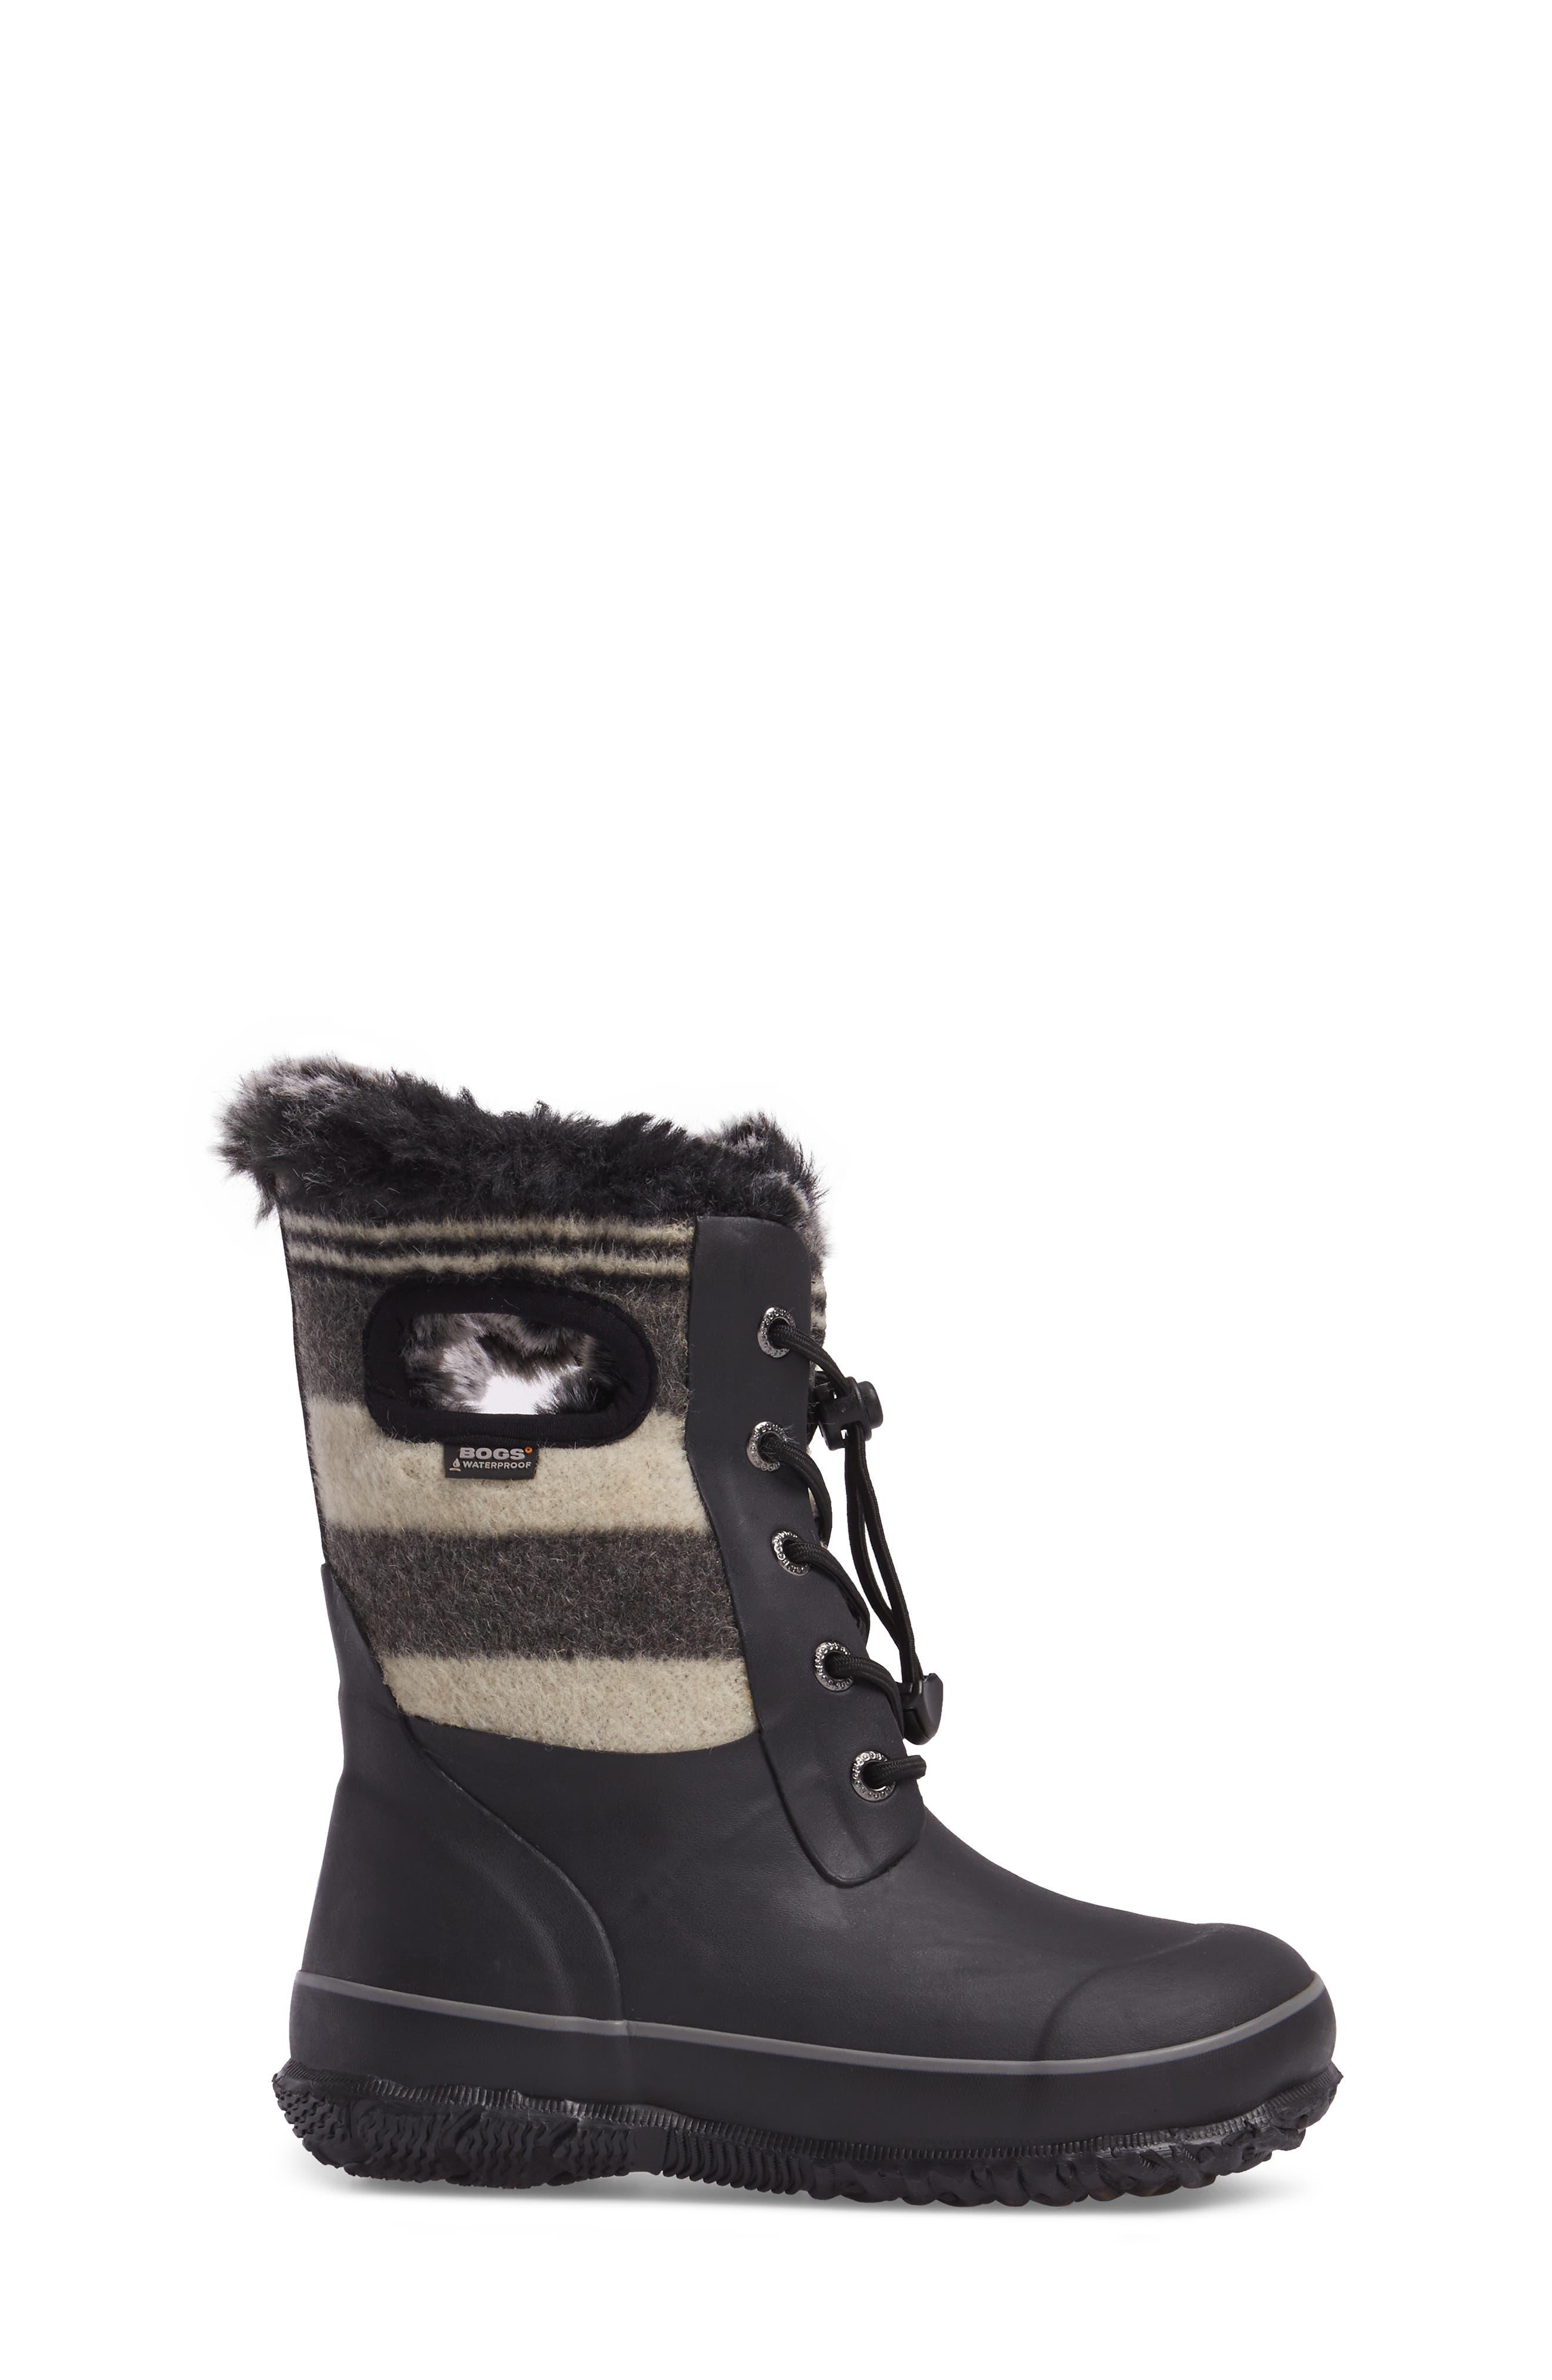 Alternate Image 3  - Bogs Arcata Stripe Waterproof Insulated Faux Fur Boot (Walker, Toddler, Little Kid & Big Kid)